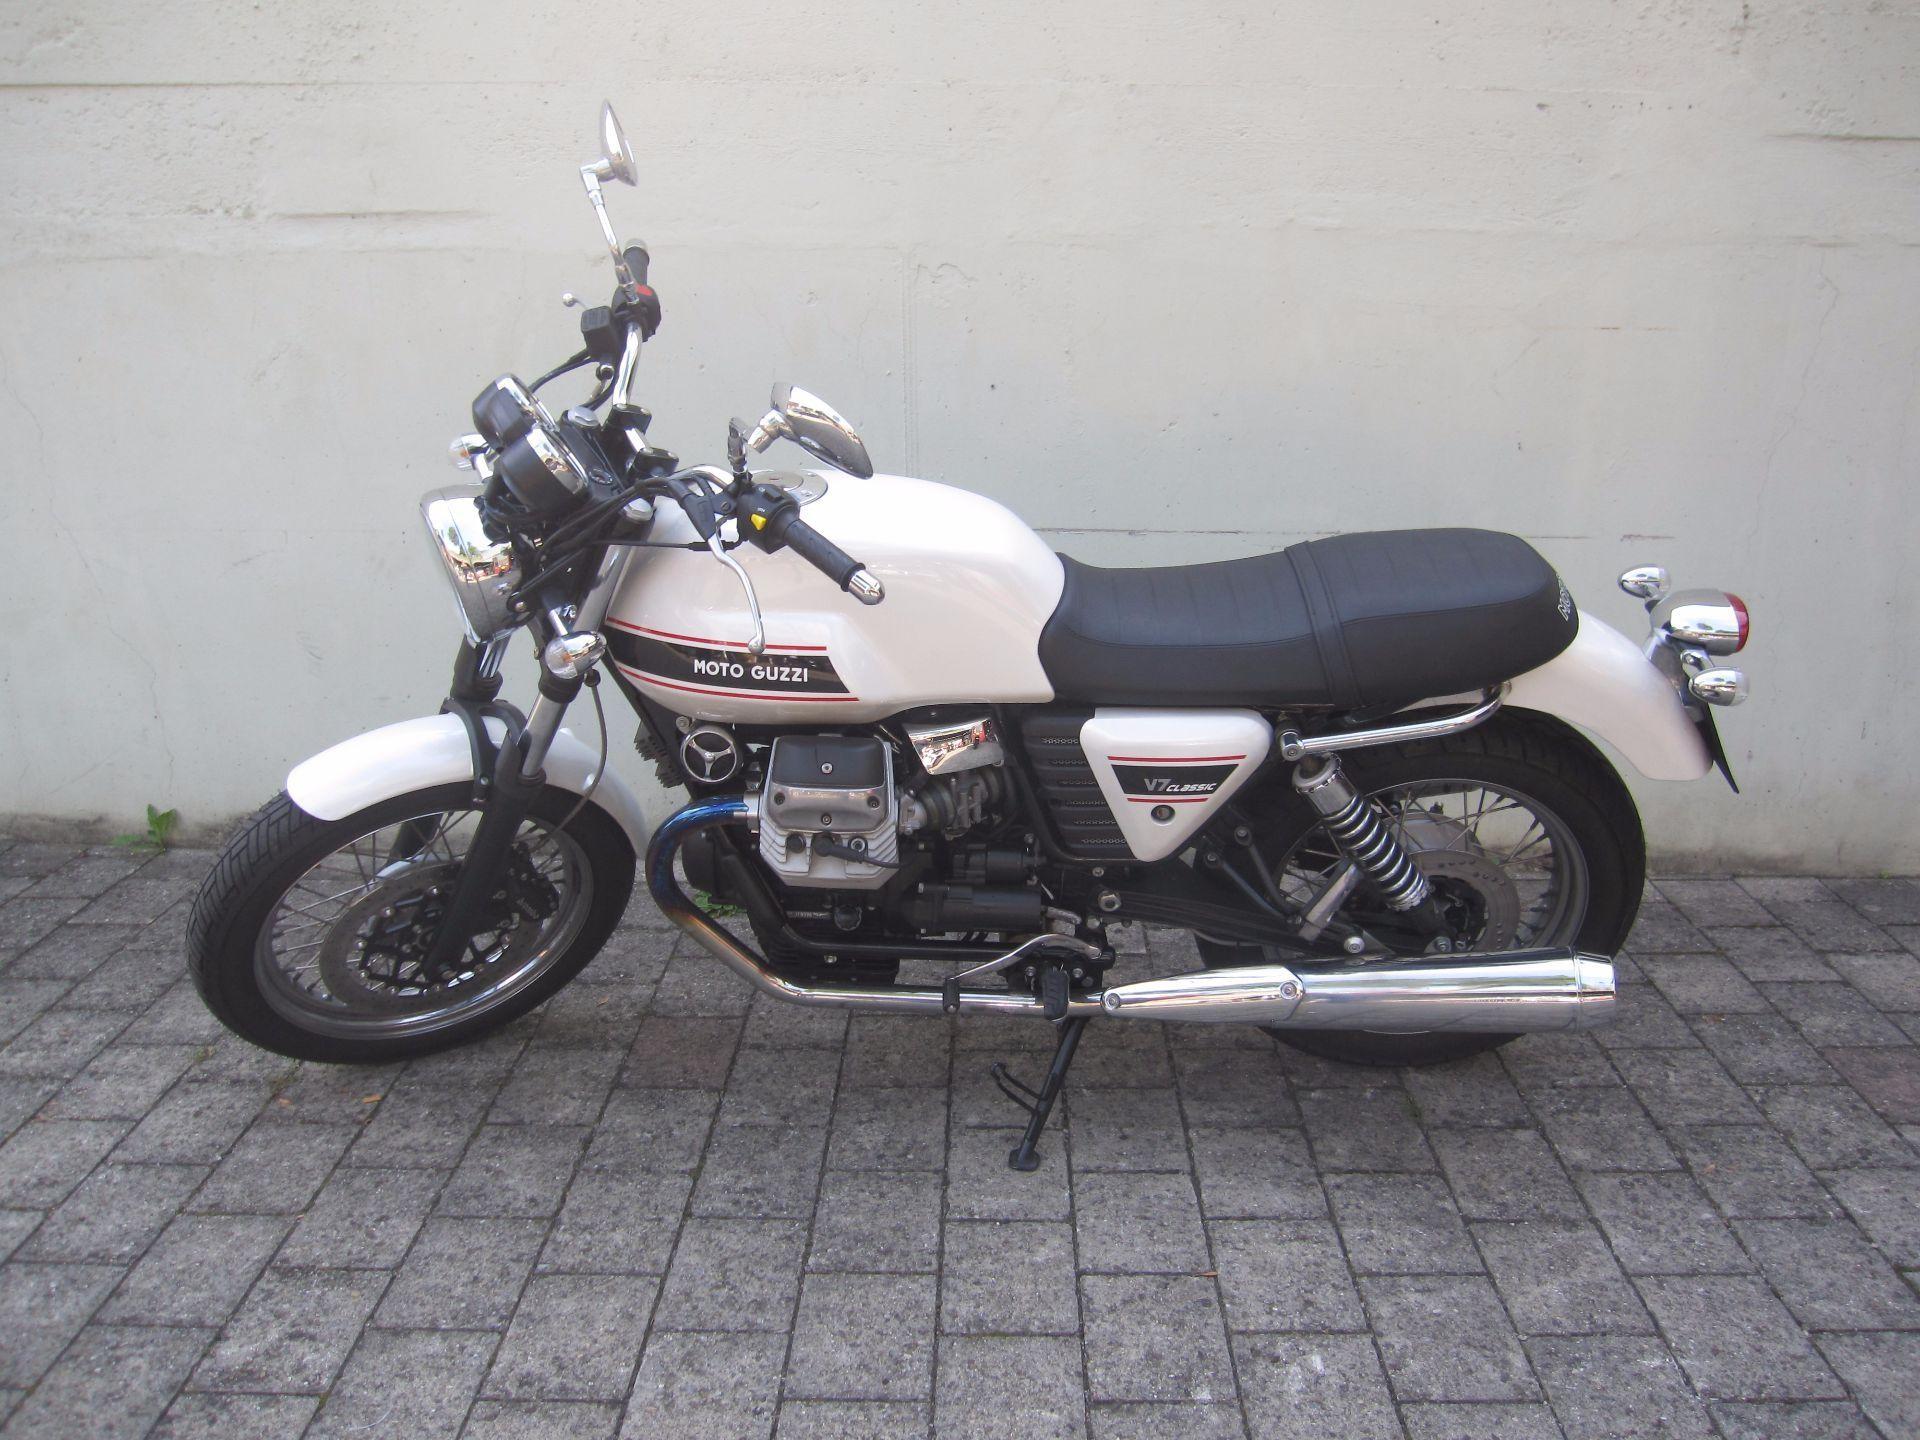 moto occasions acheter moto guzzi v7 750 classic t ff huus moosleerau moosleerau. Black Bedroom Furniture Sets. Home Design Ideas